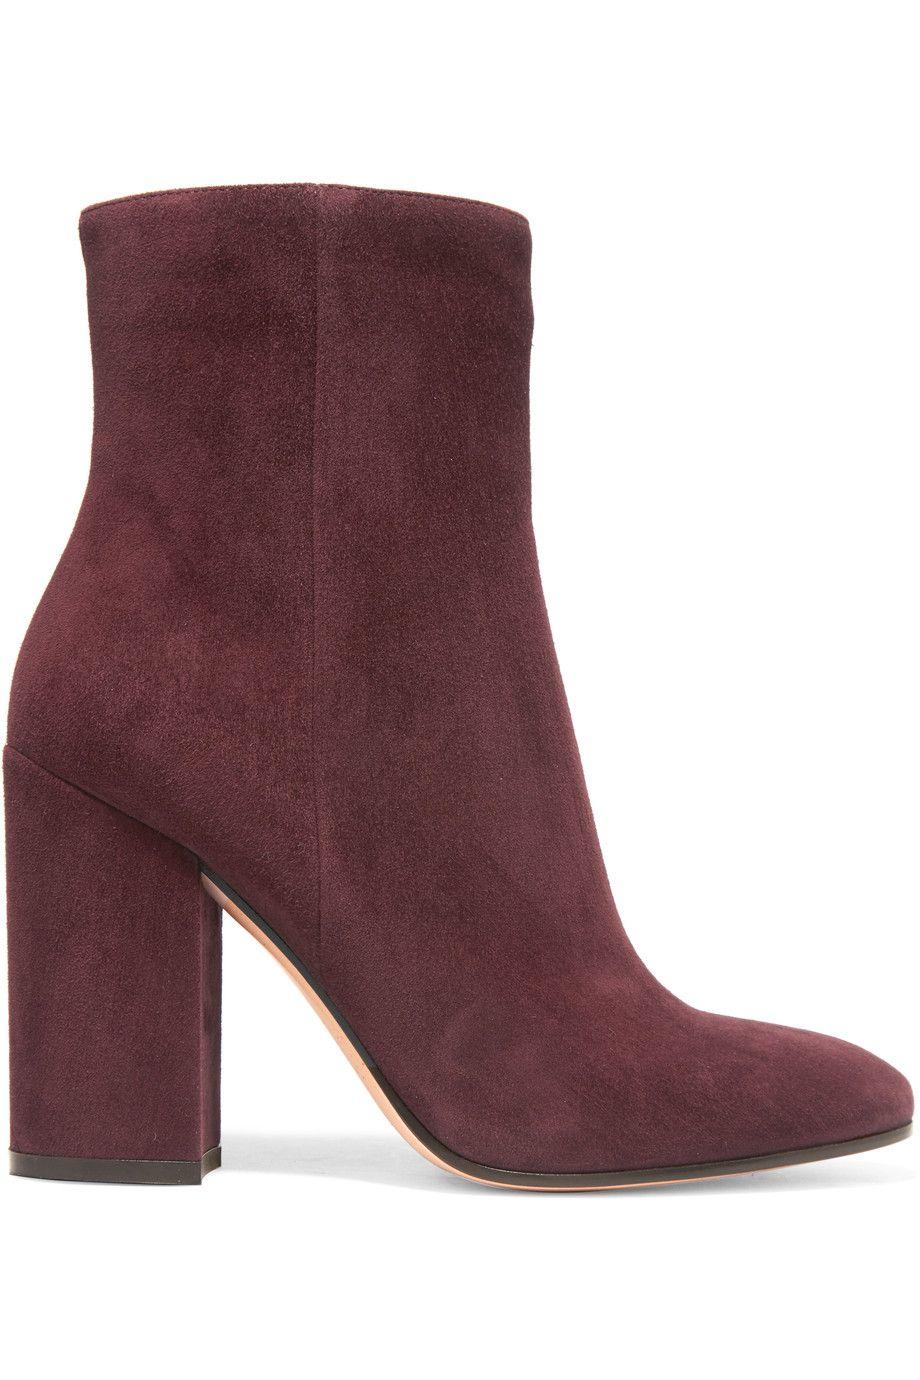 Comfortable High Heels BAZAAR Editors Swear By